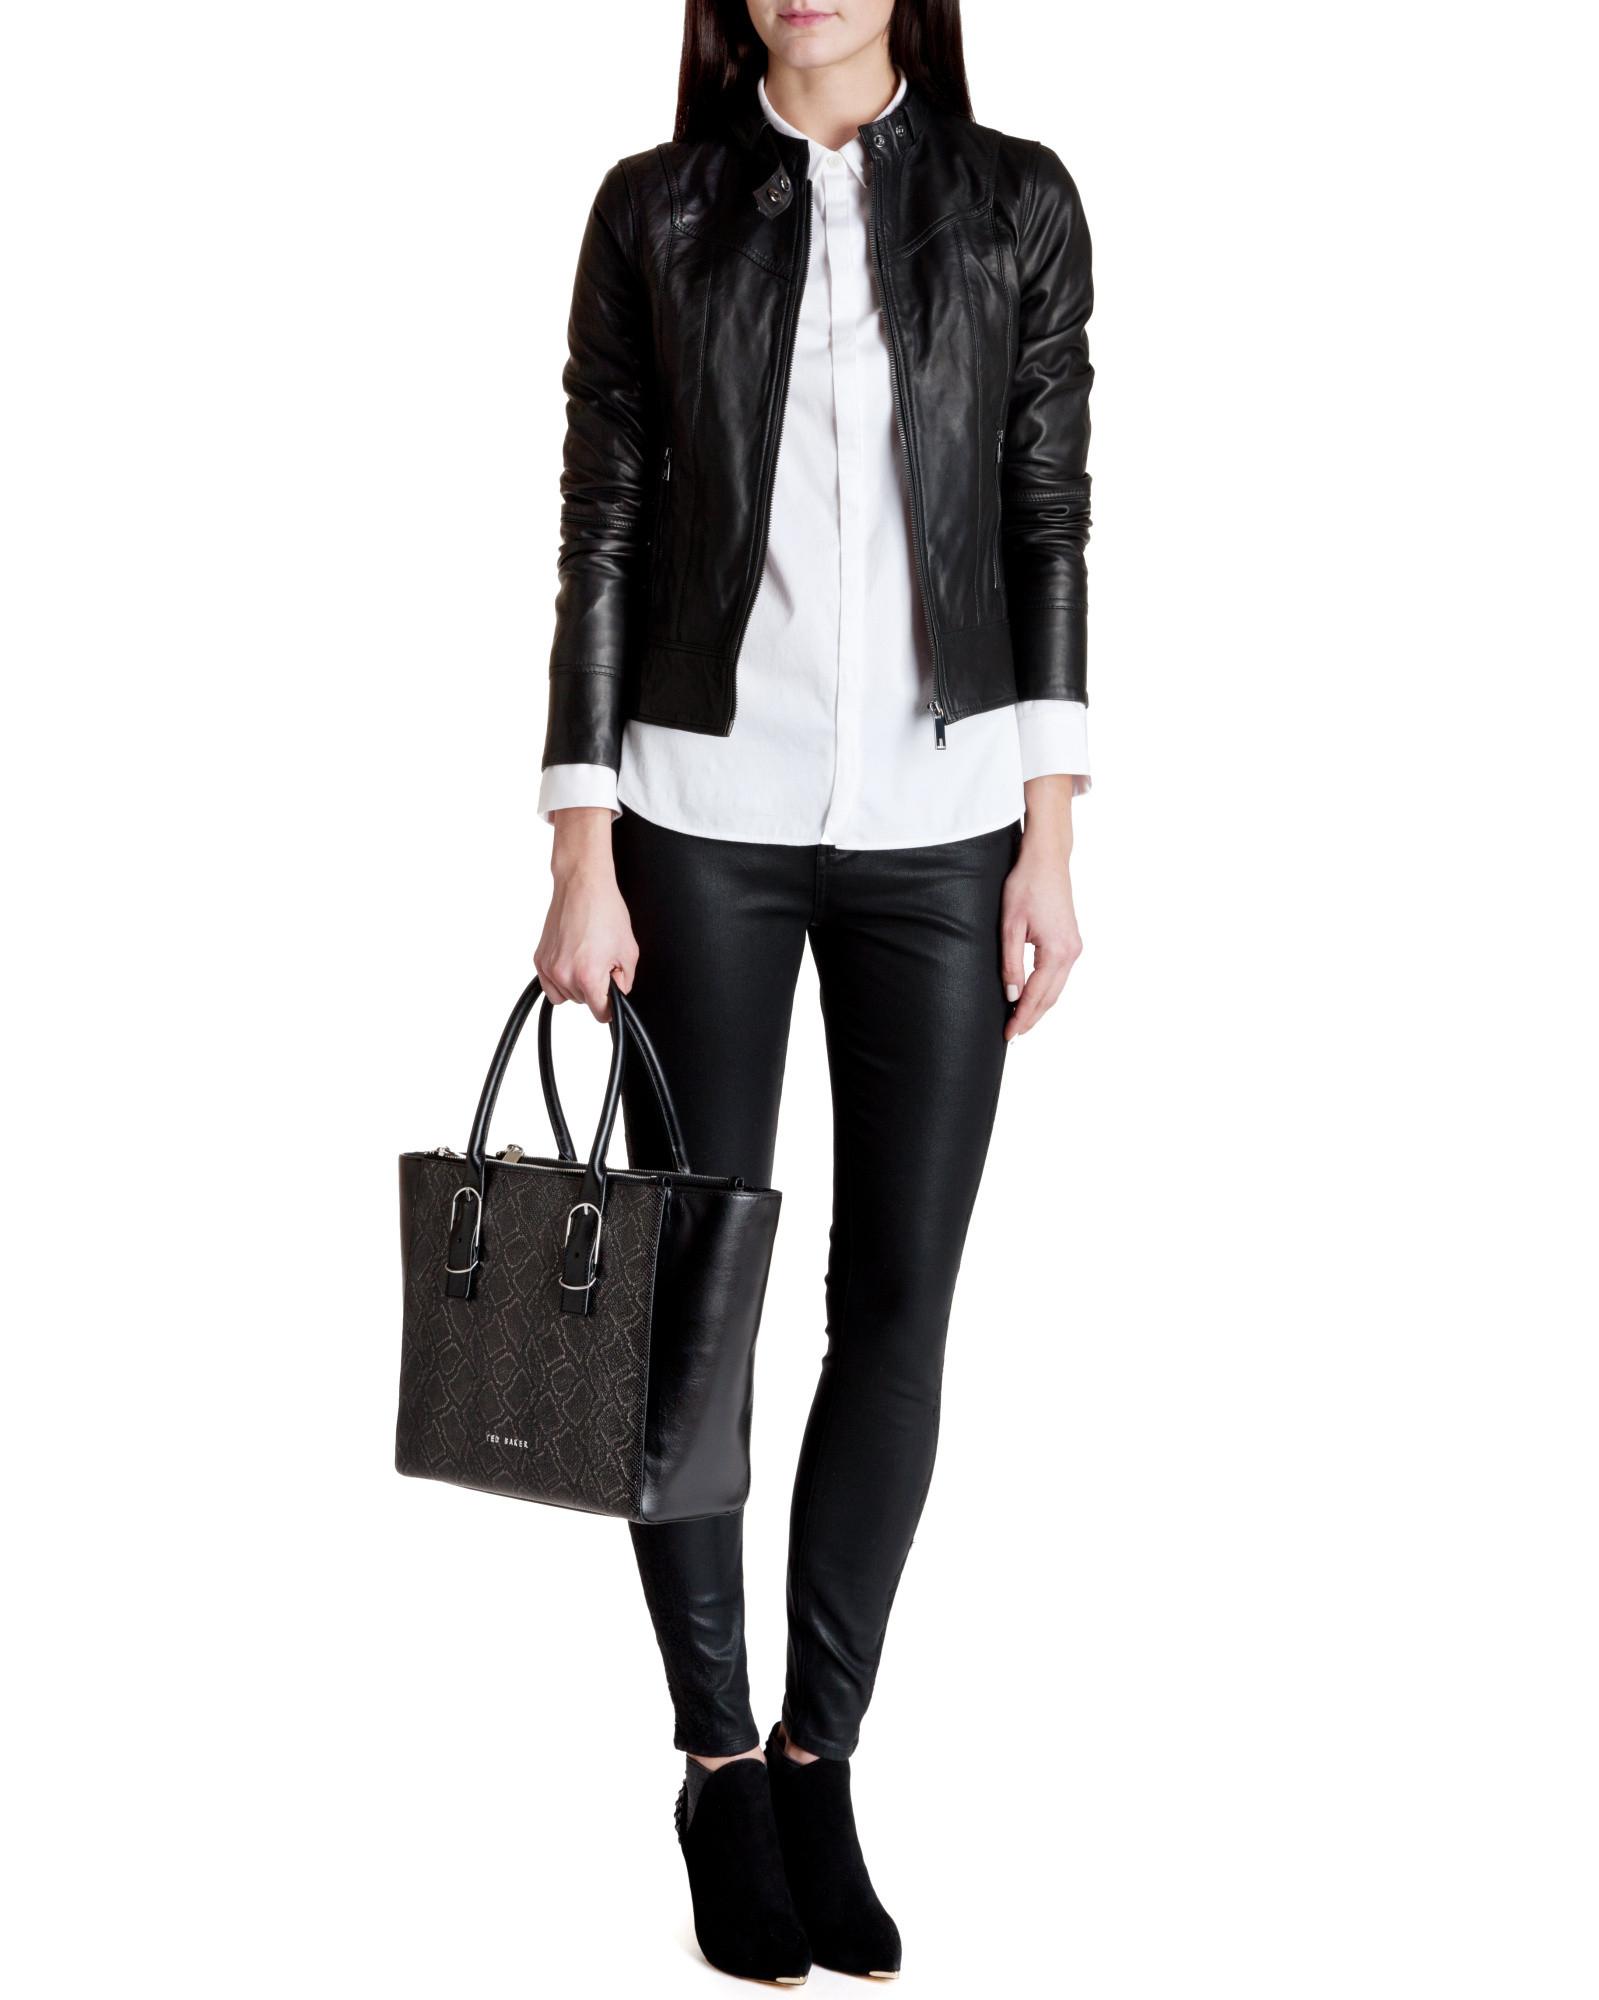 97ac8e0efefa52 Ted Baker Brezan Panelled Leather Jacket in Black - Lyst